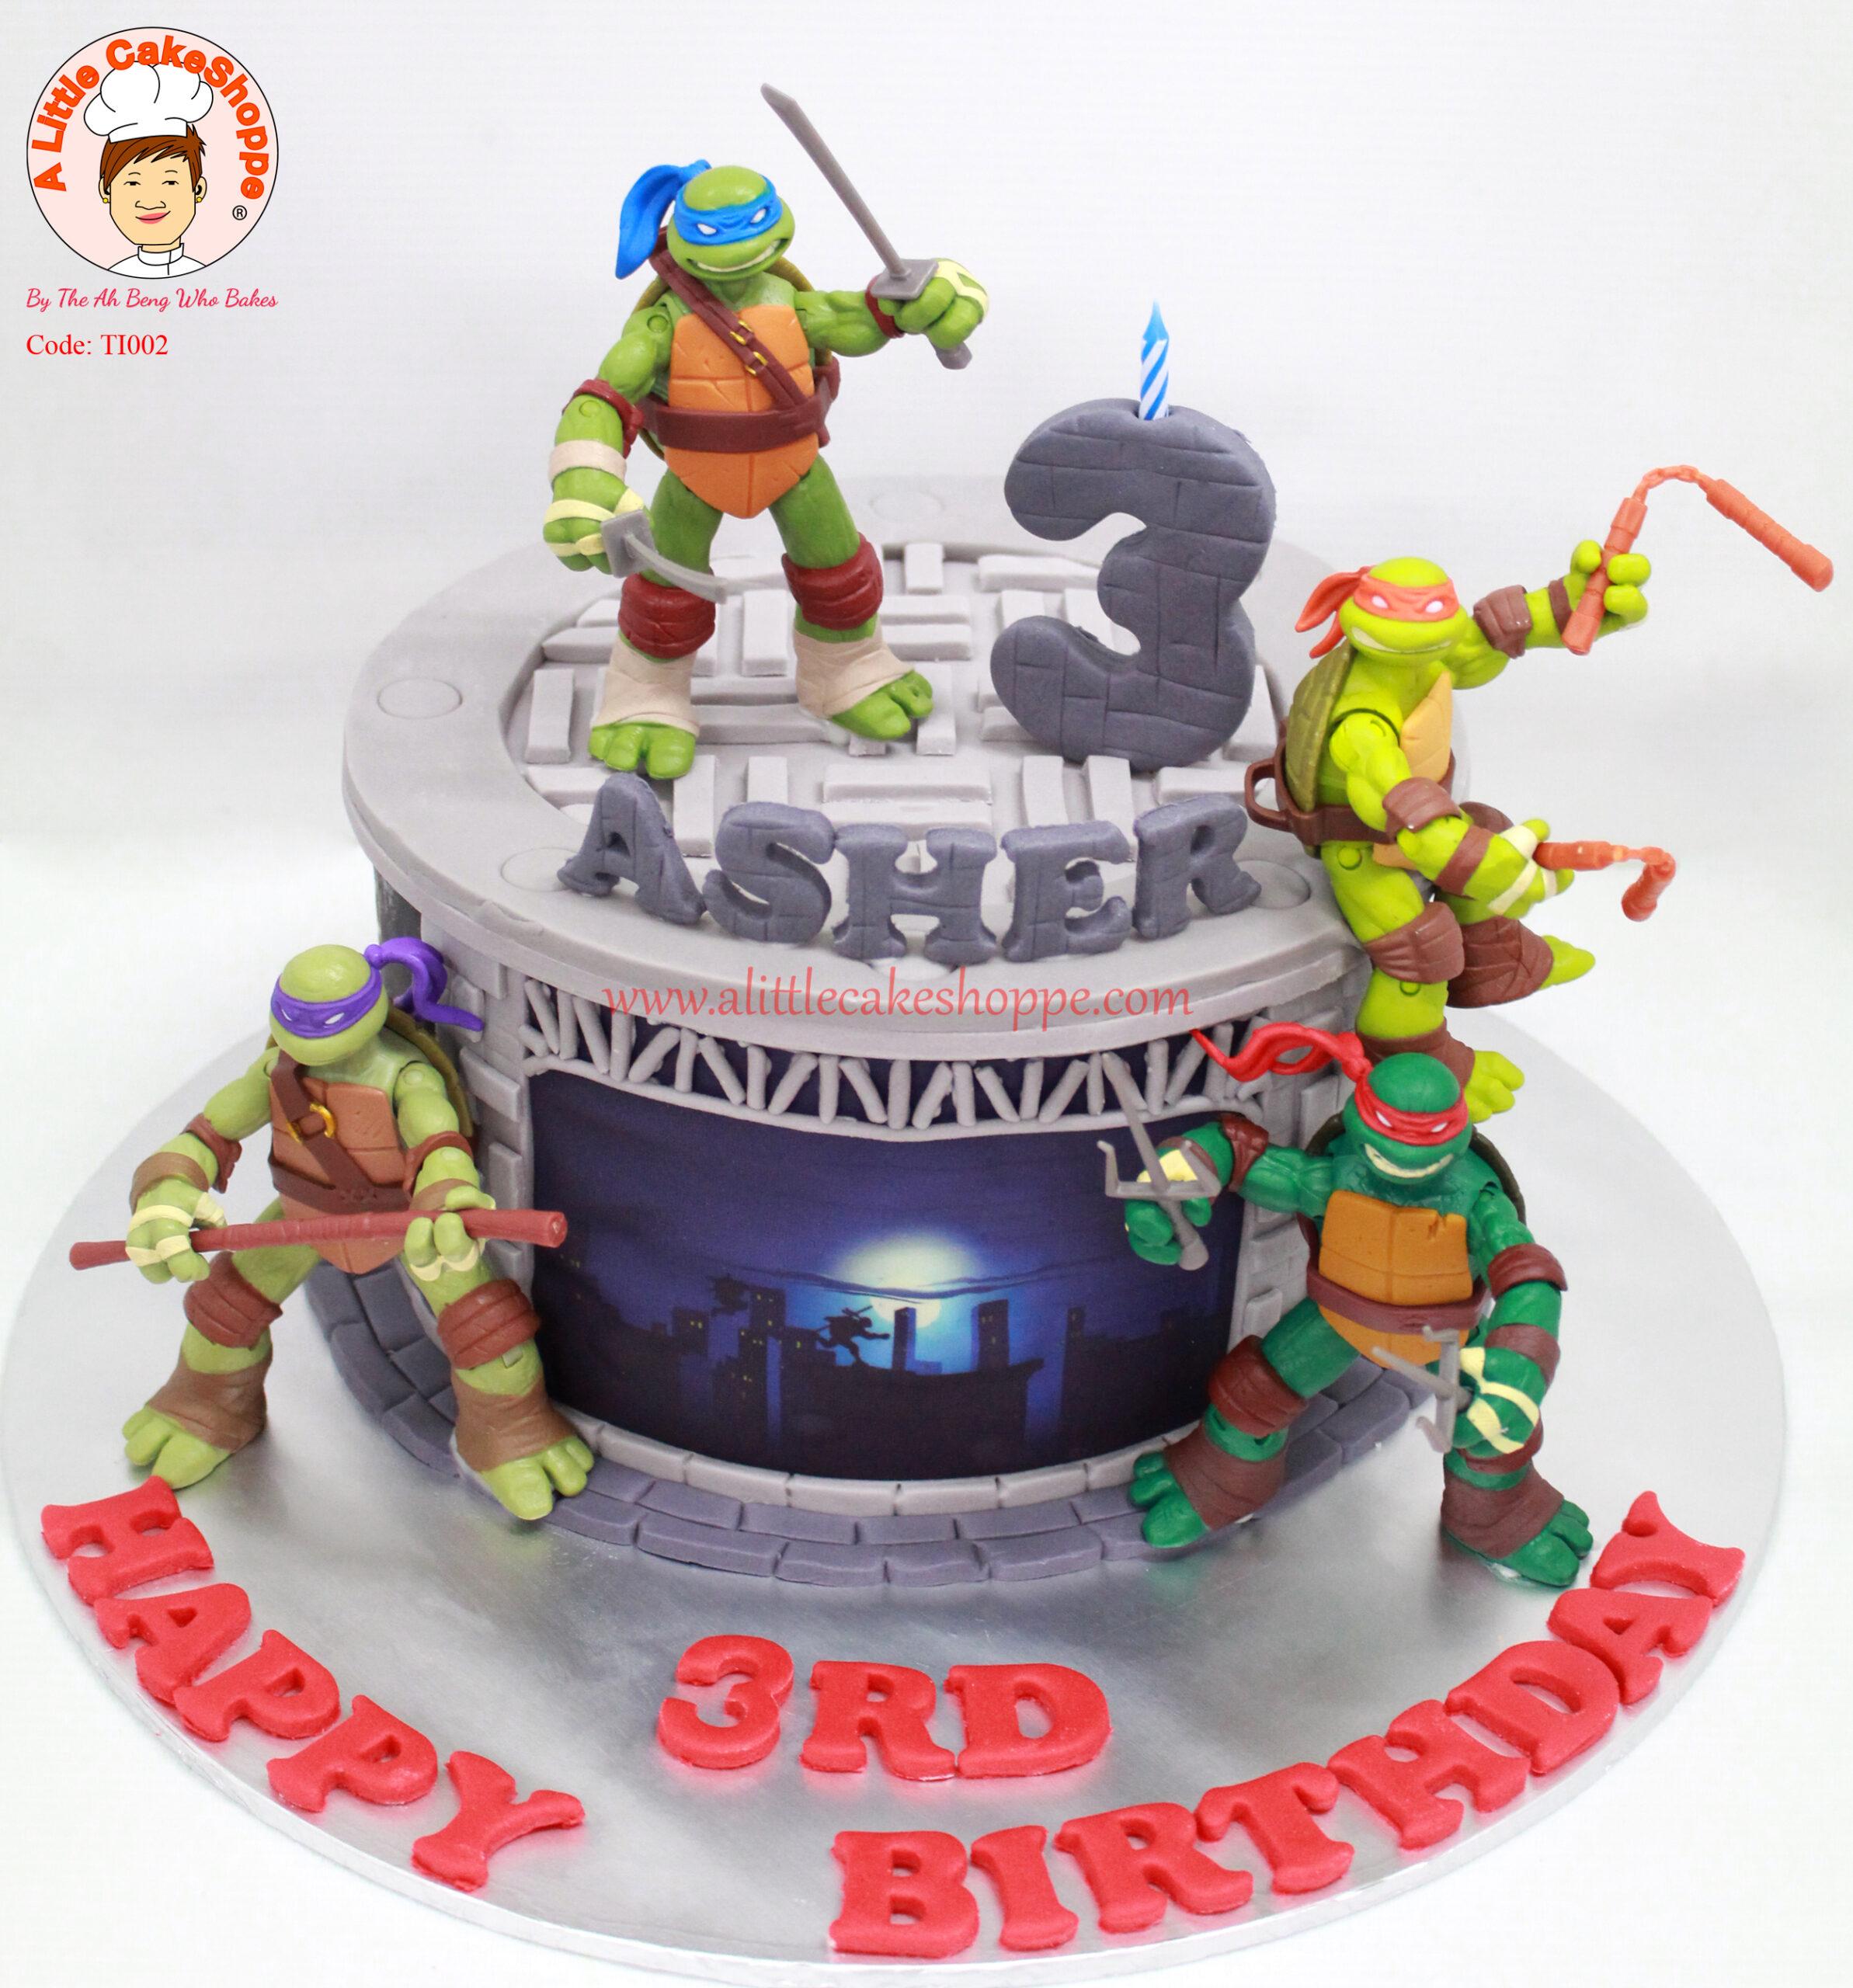 Best Customised Cake Singapore custom cake 2D 3D birthday cake cupcakes wedding corporate events anniversary fondant fresh cream buttercream cakes alittlecakeshoppe a little cake shoppe compliments review singapore bakers SG cakeshop ah beng who bakes teenage mutant ninja turtles